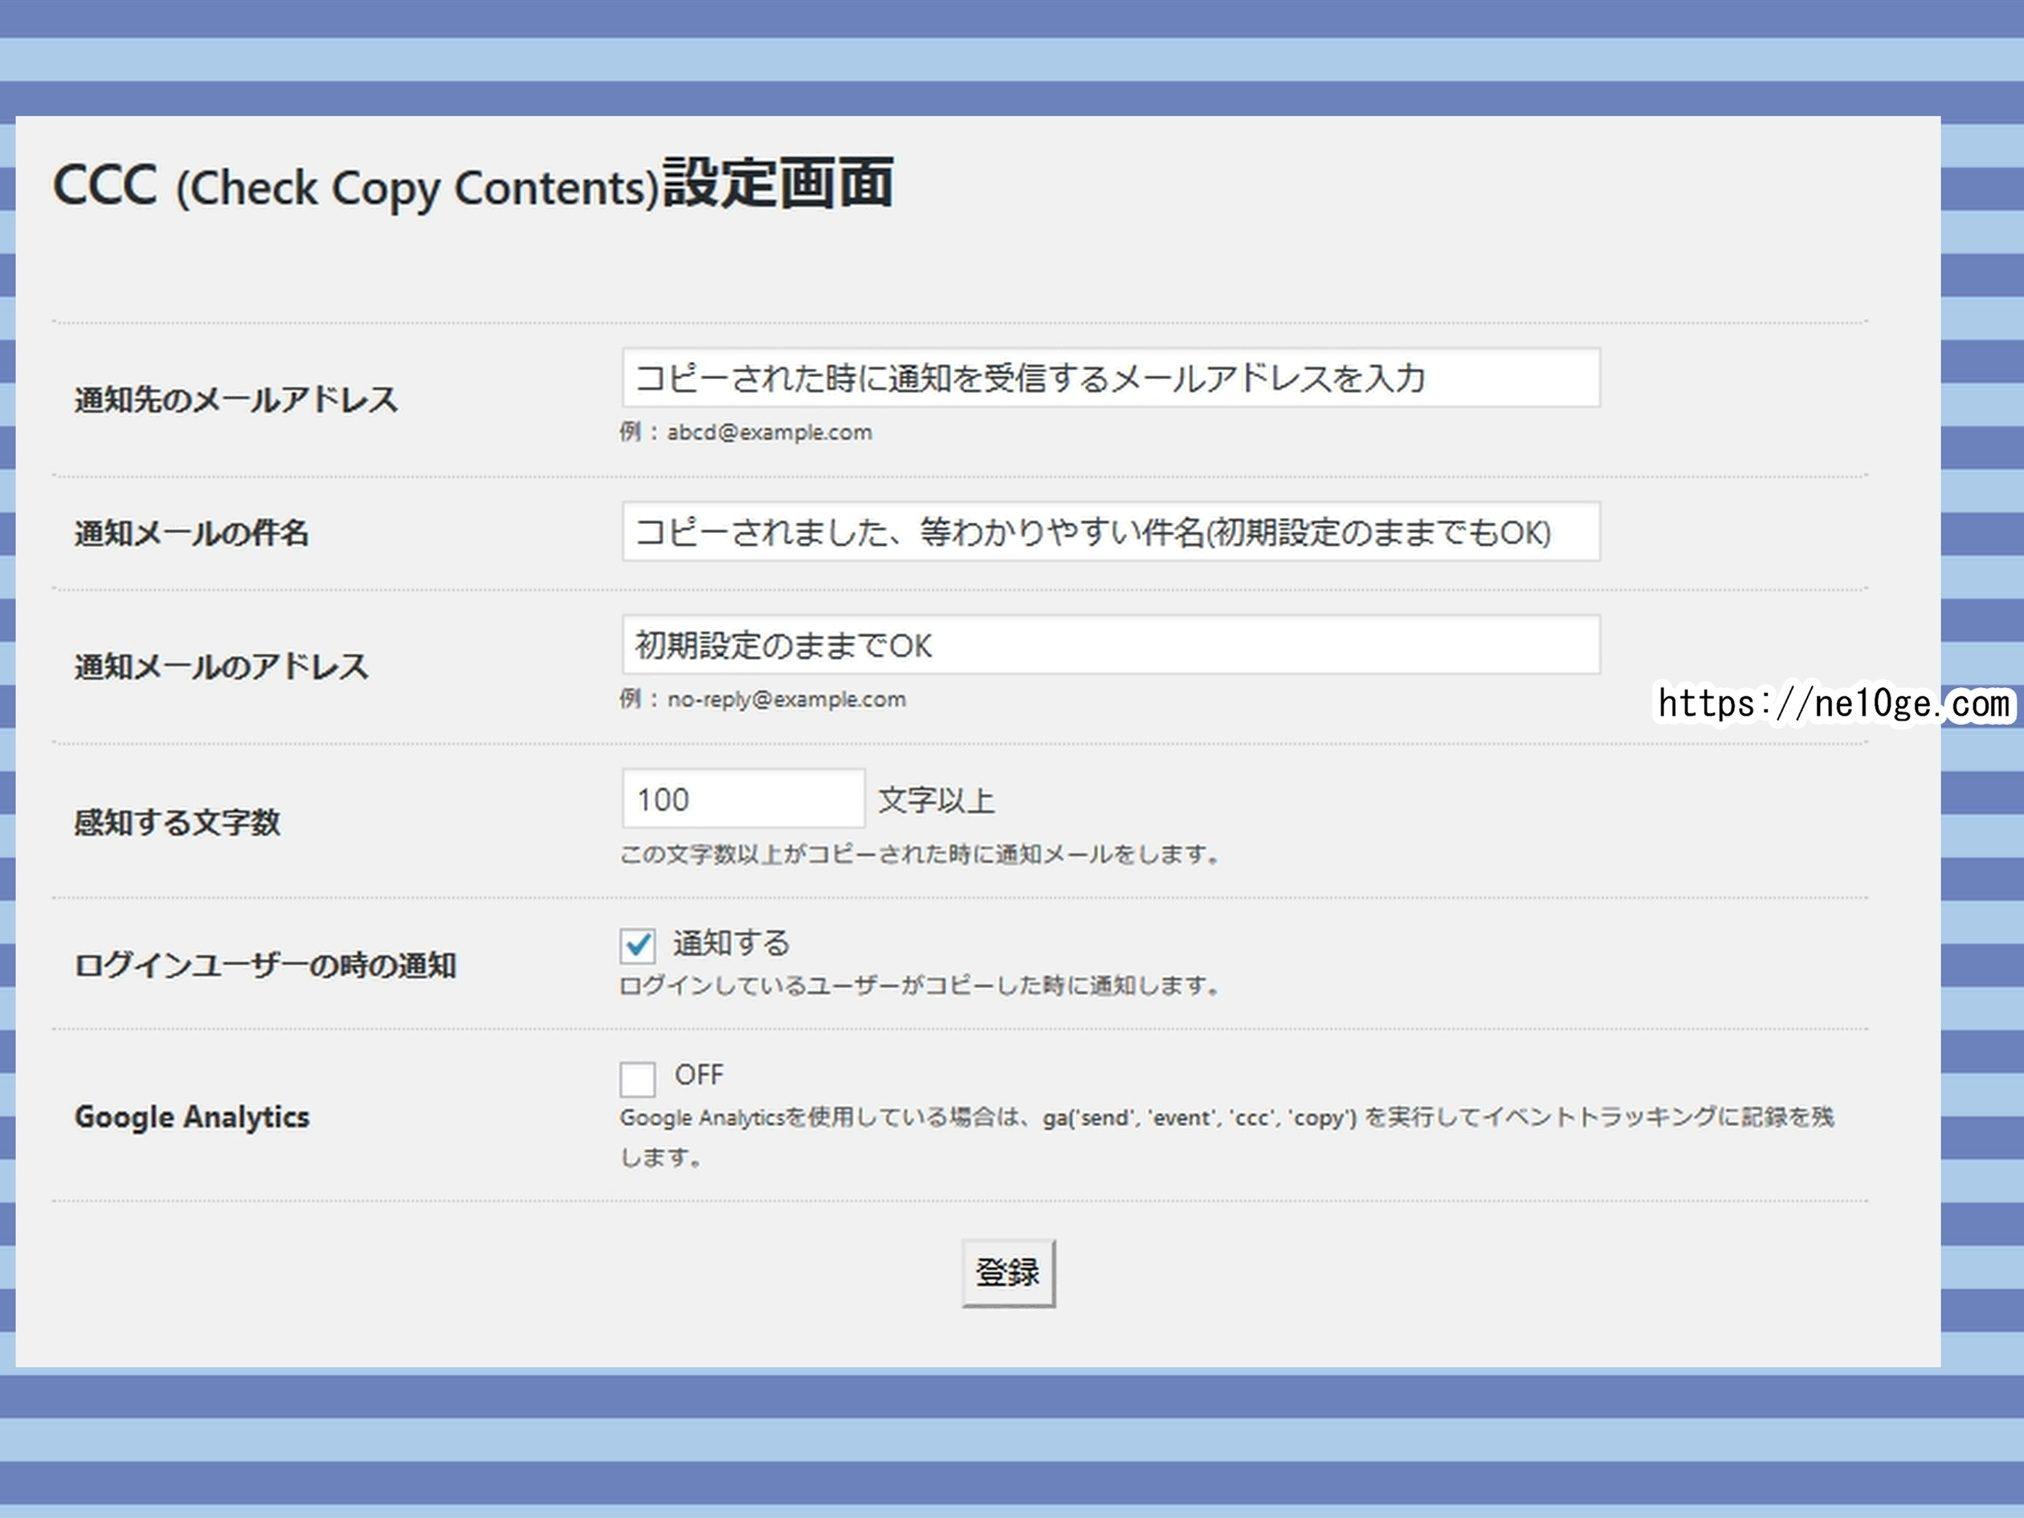 Check Copy Contents(CCC)の設定方法